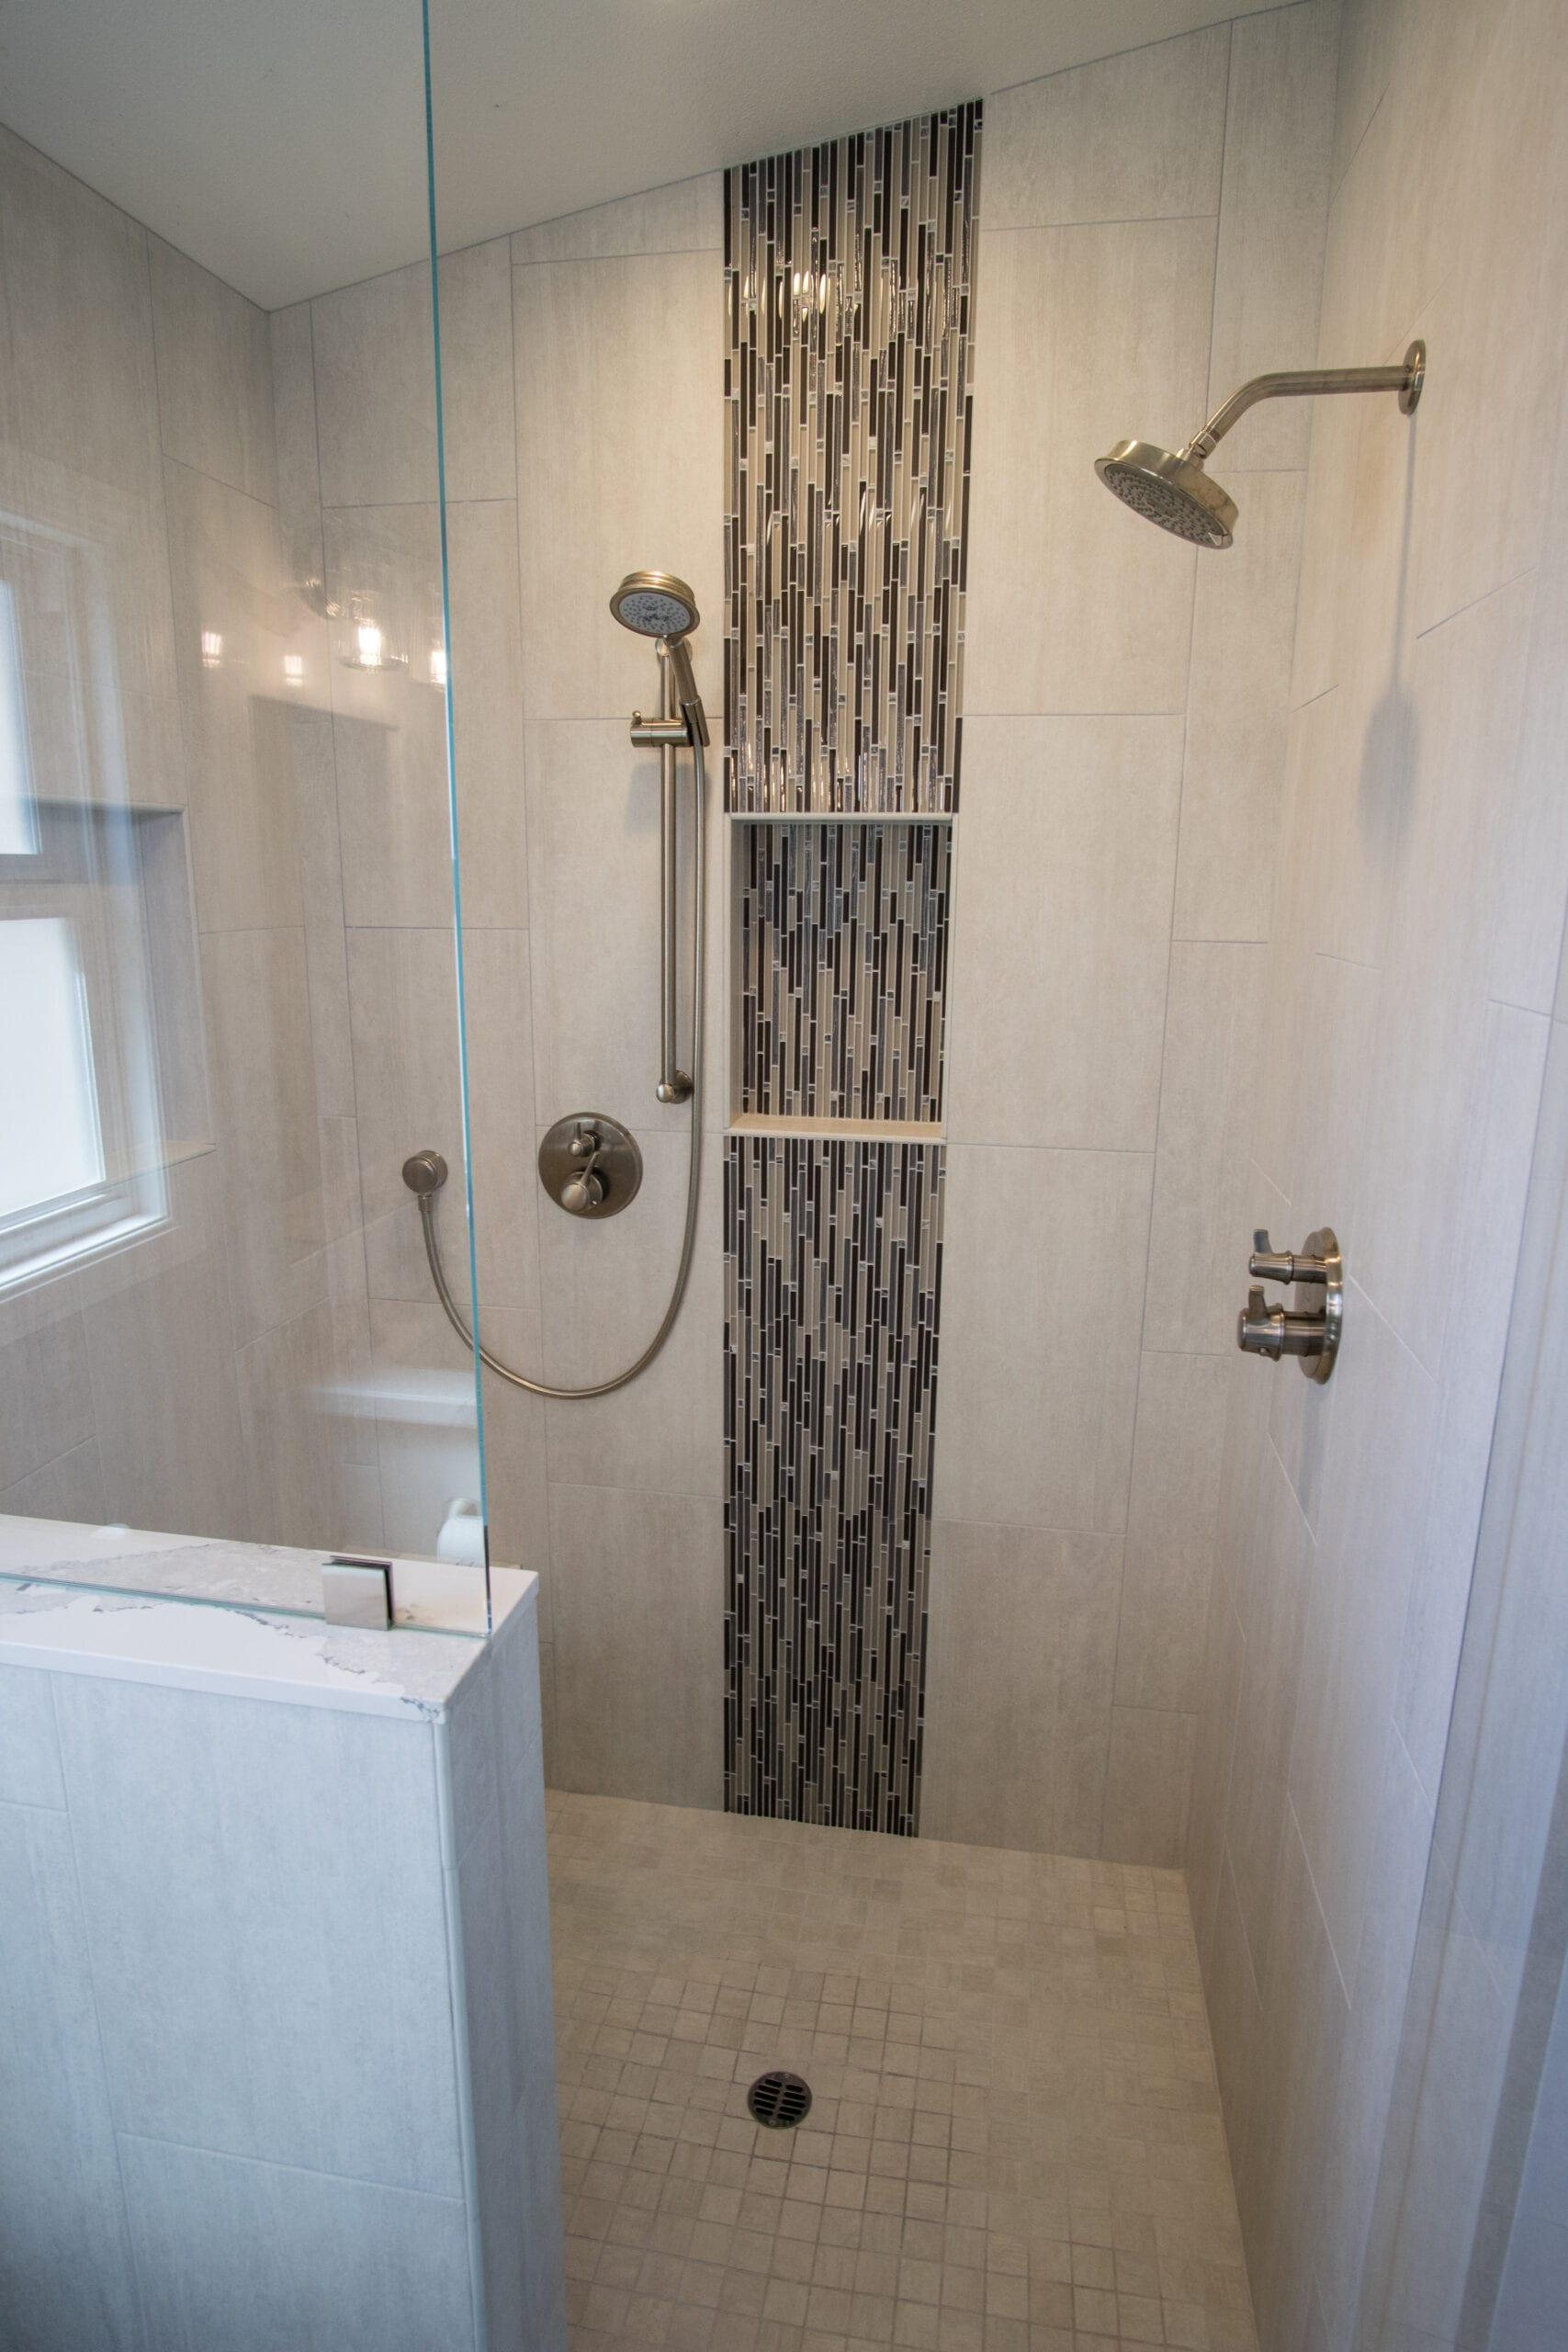 Saunders mosaic vertical tile niche